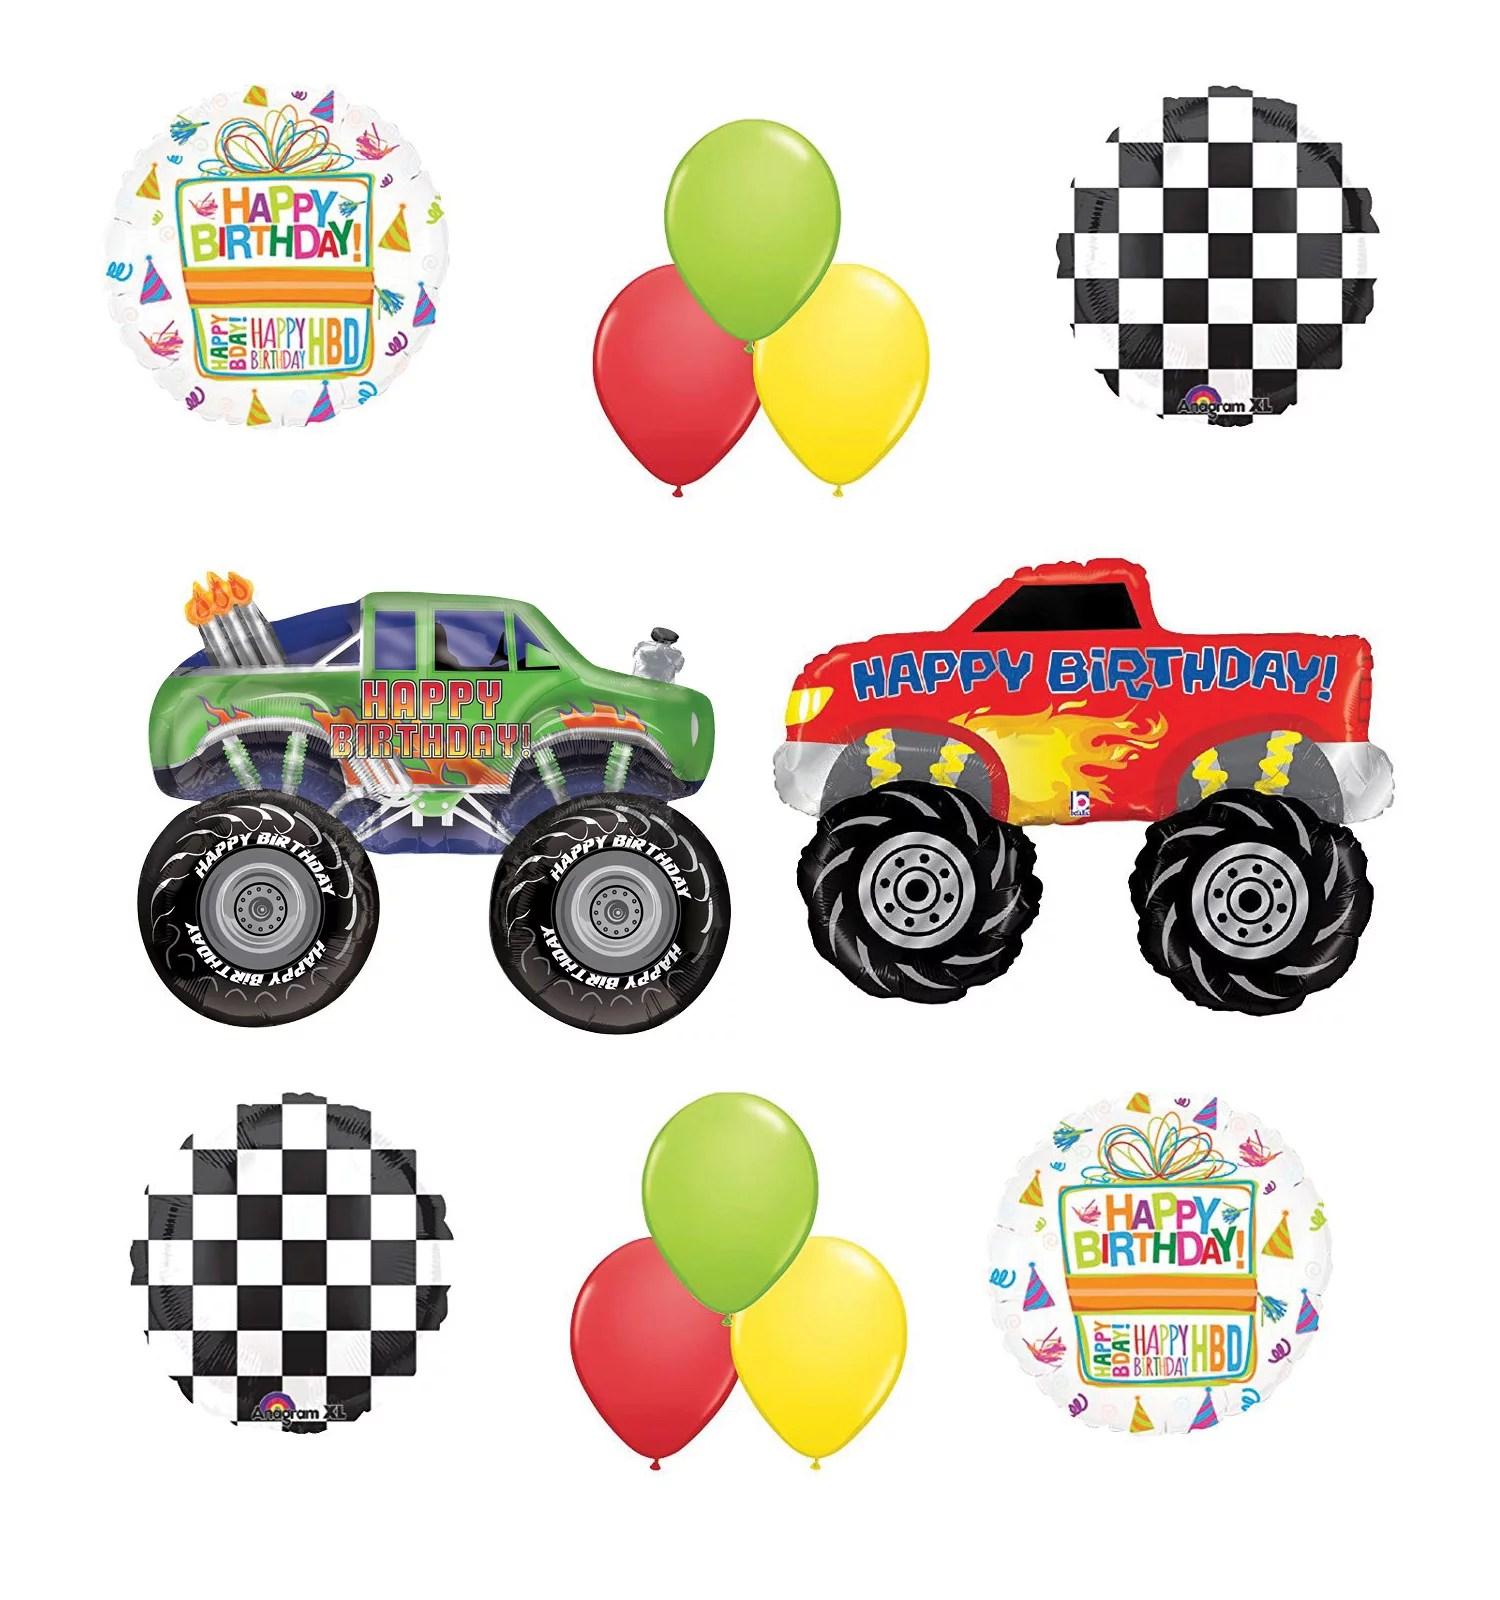 Monster Truck Birthday Party Supplies And Balloon Bouquet Decorations Walmart Com Walmart Com